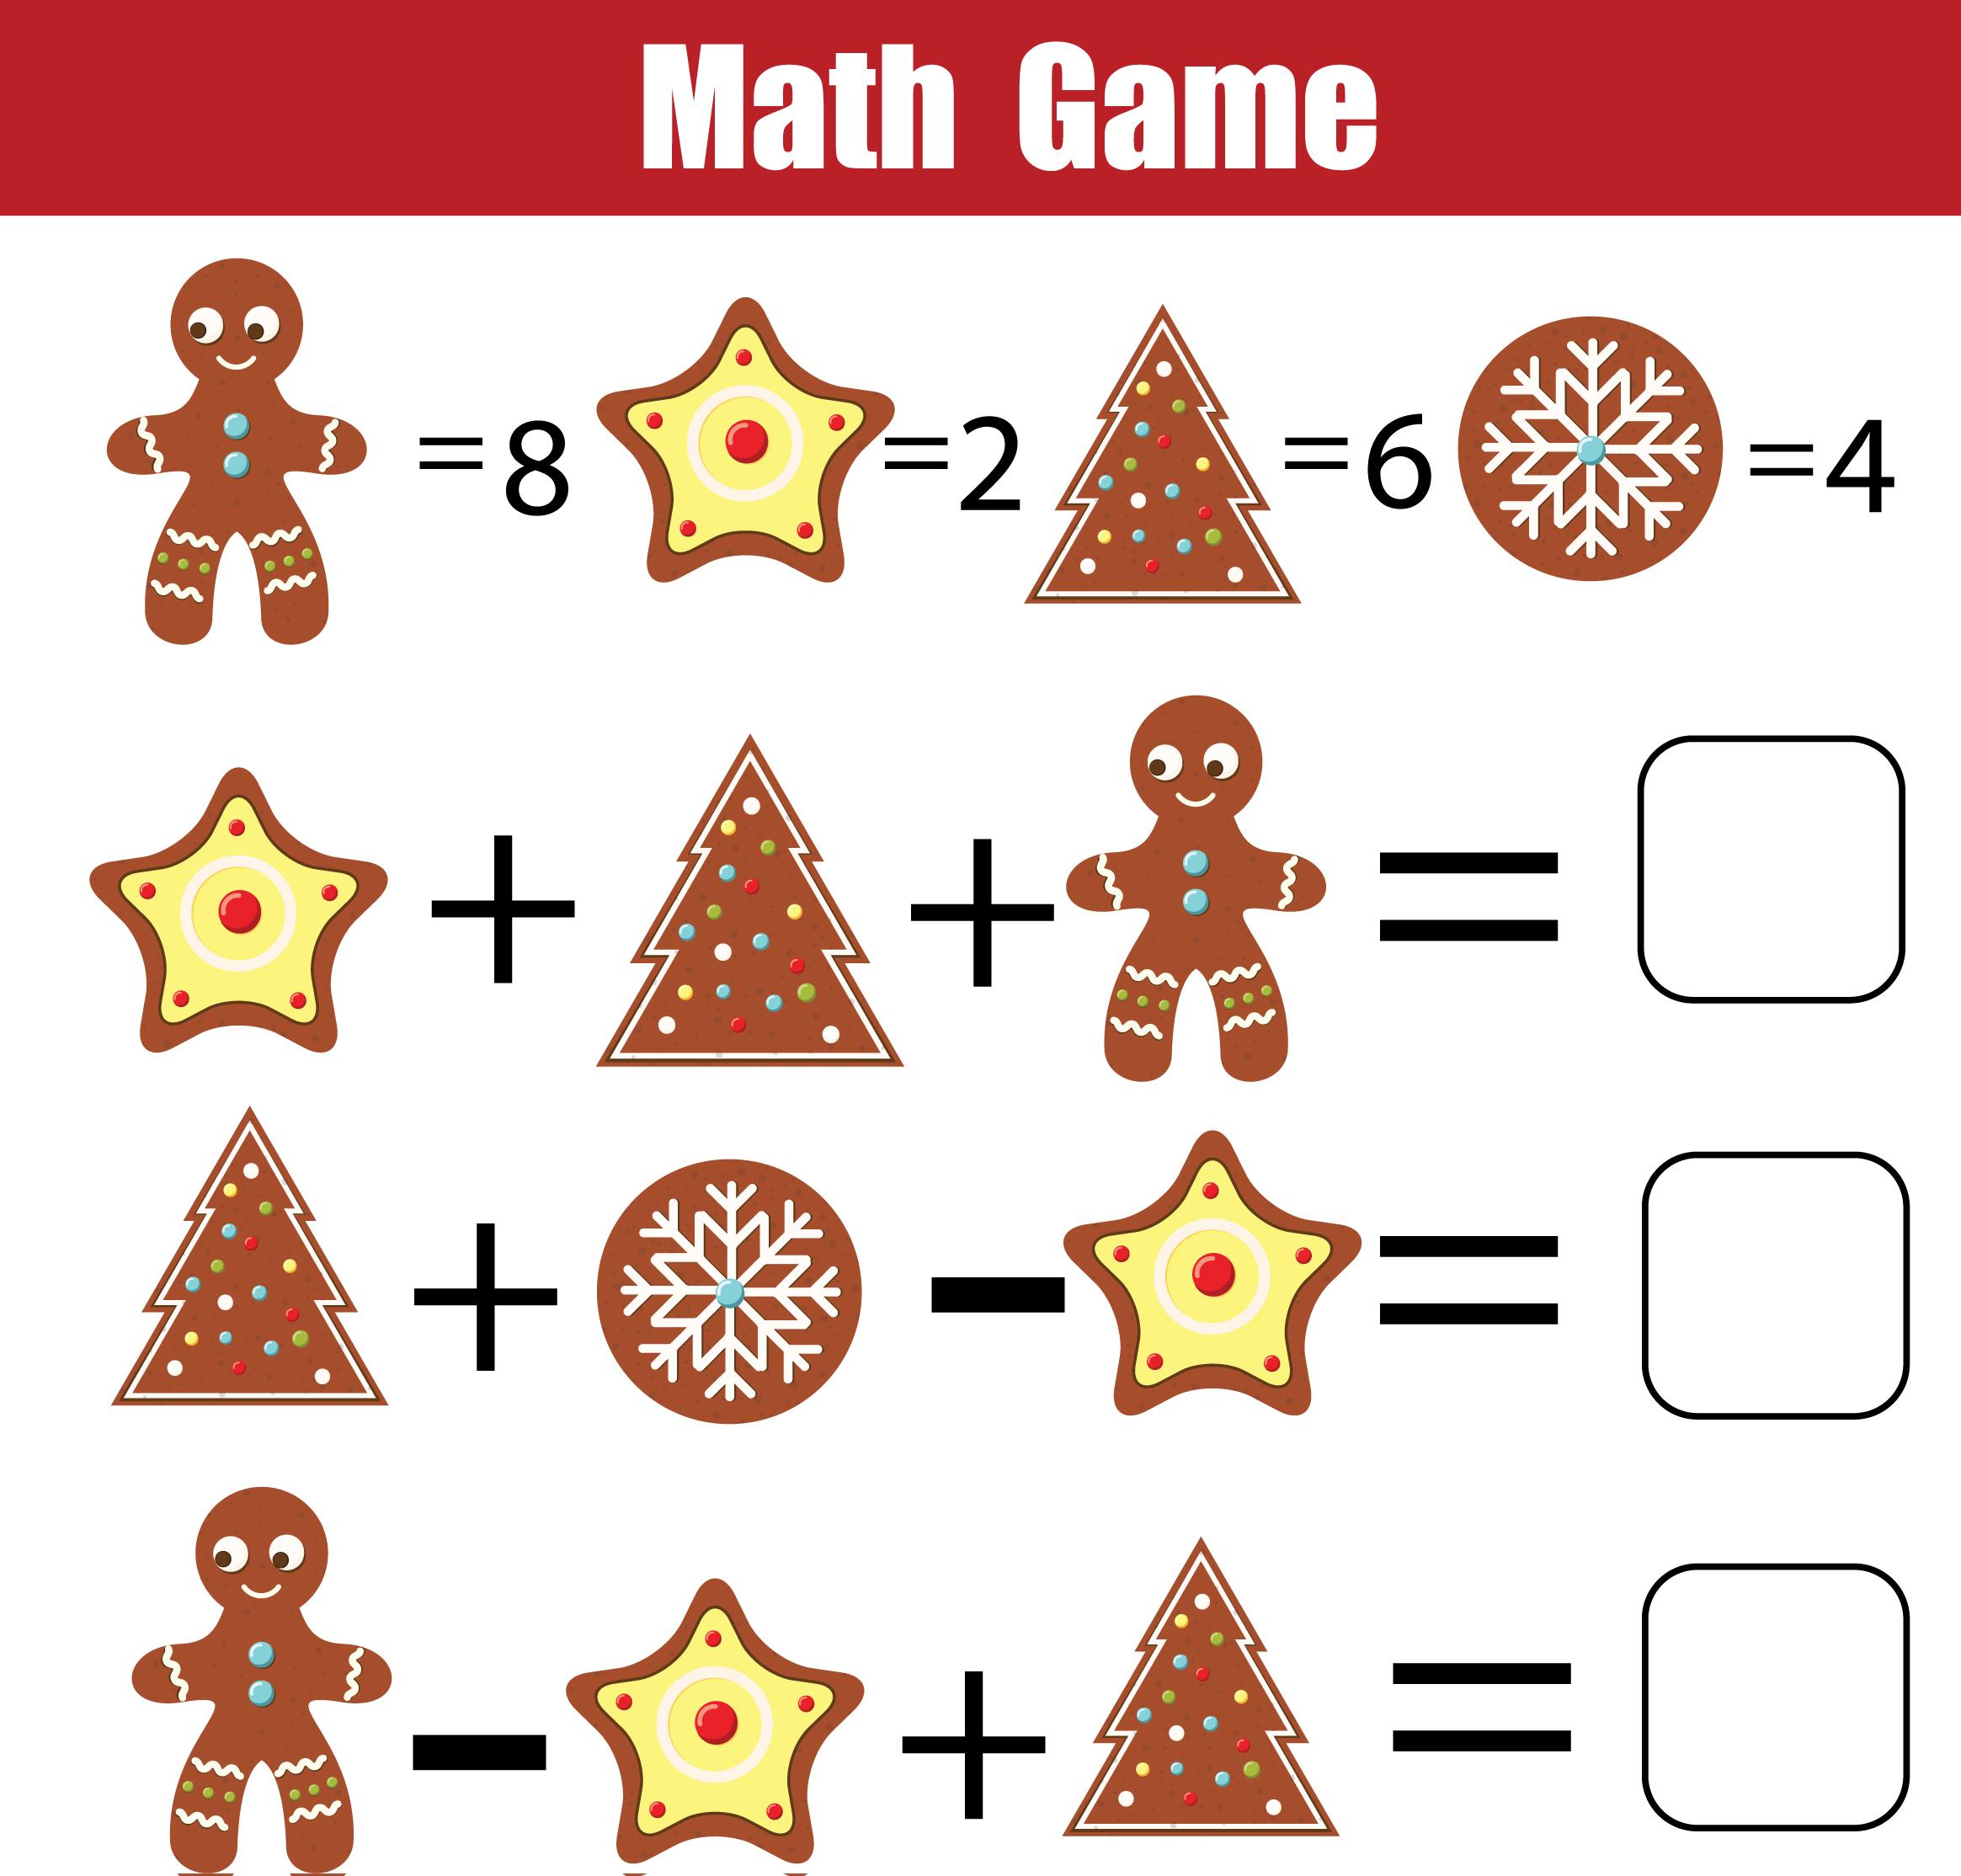 photo regarding Christmas Crossword Puzzle Printable named Xmas Crossword Puzzle Printable - Thrifty Mommas Pointers